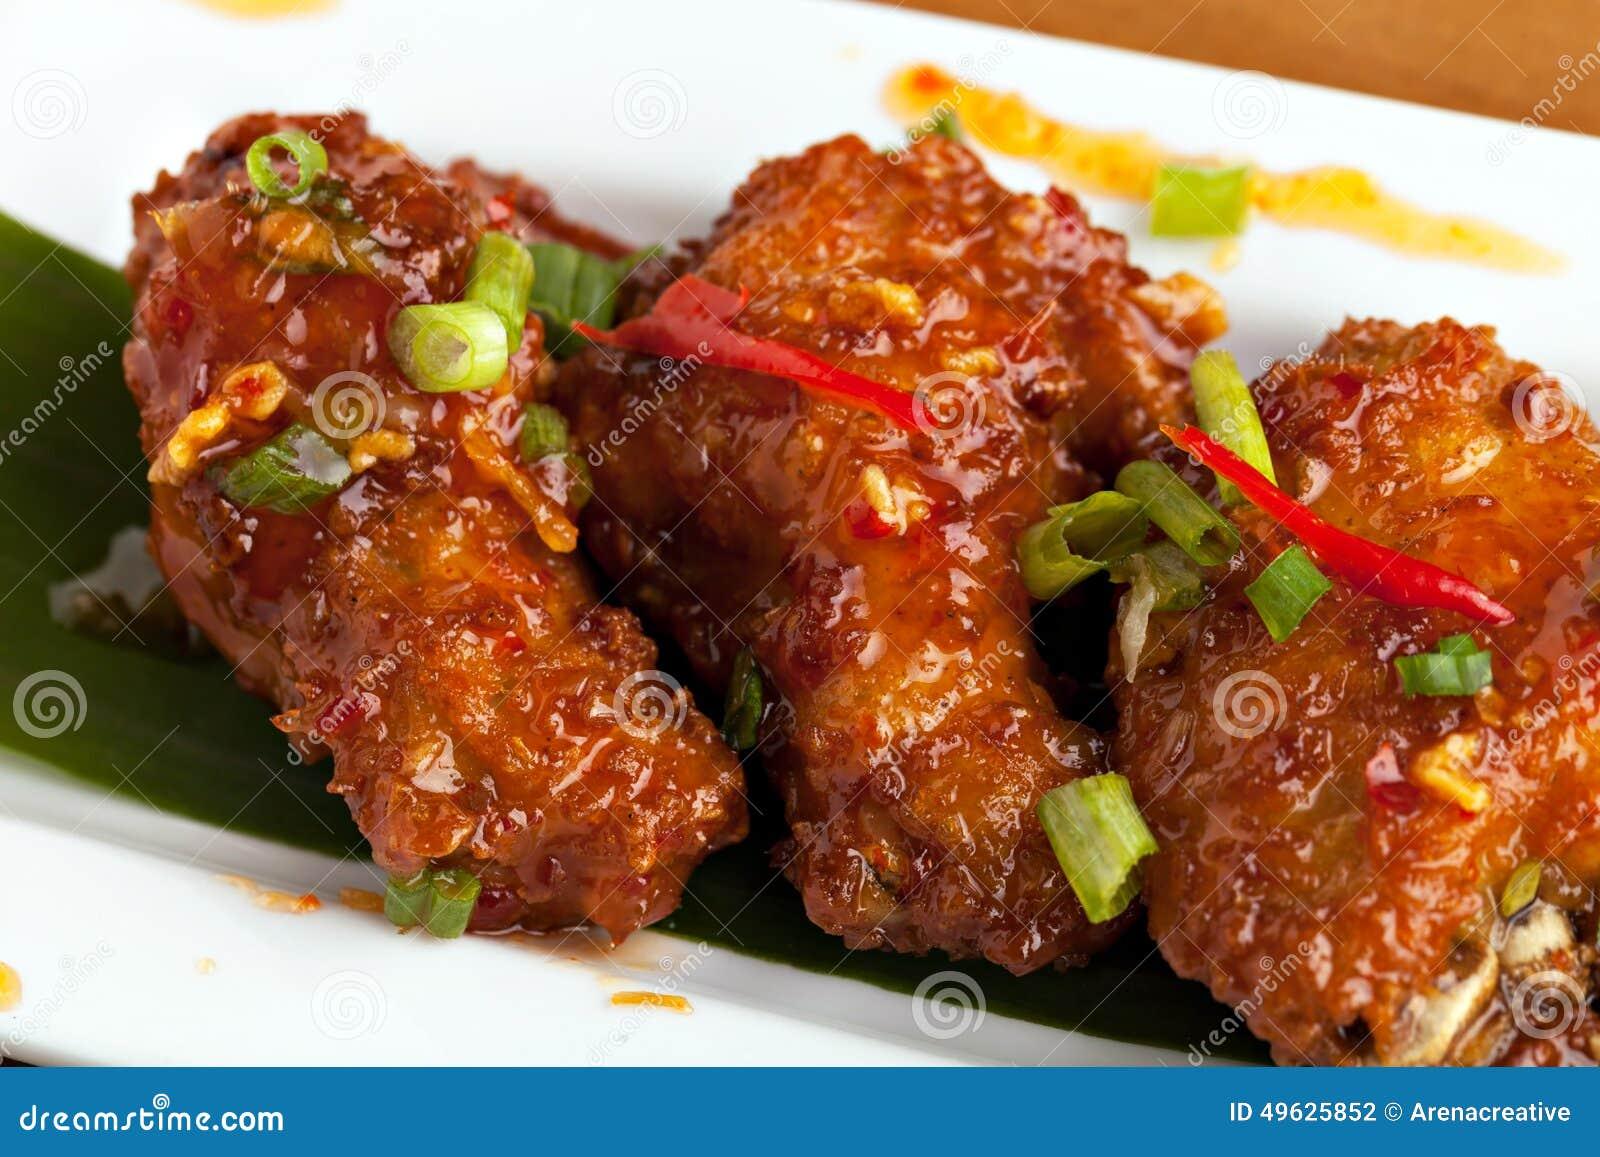 Thai Buffalo Wings Stock Photo - Image: 49625852